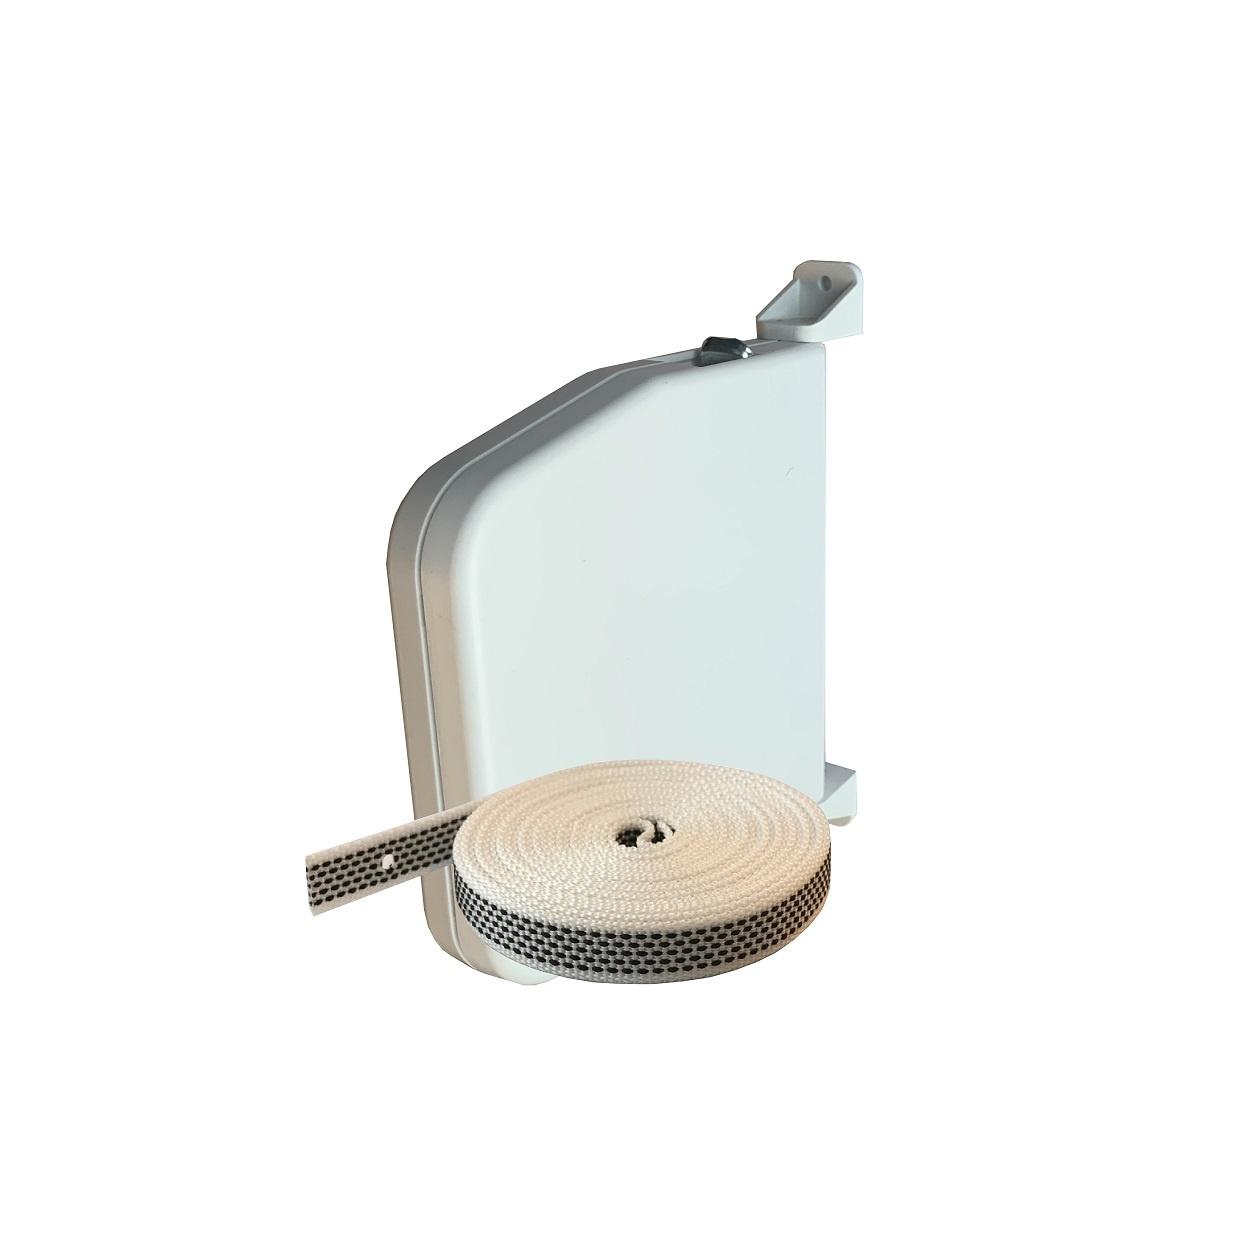 Selve Bandopwinder - bandoproller incl. 5 meter band